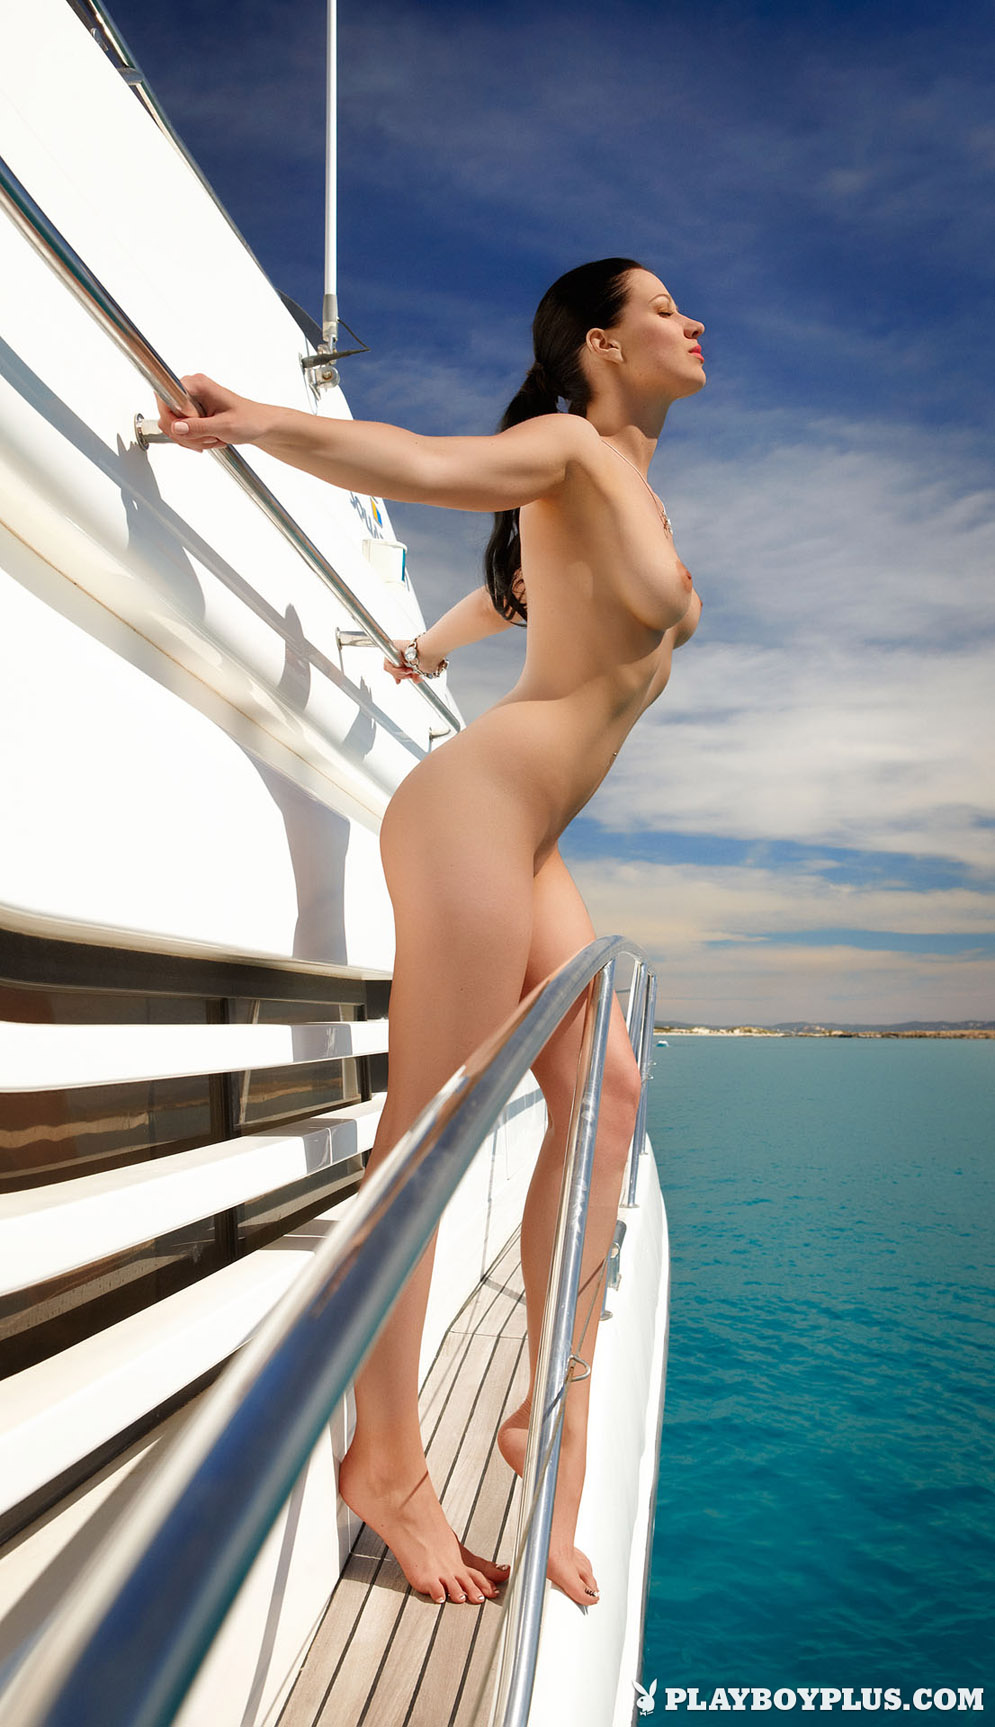 Девушка месяца, певица Сабина Жусикайте / Sabina Jucikaite - Playboy Netherlands Miss October 2010